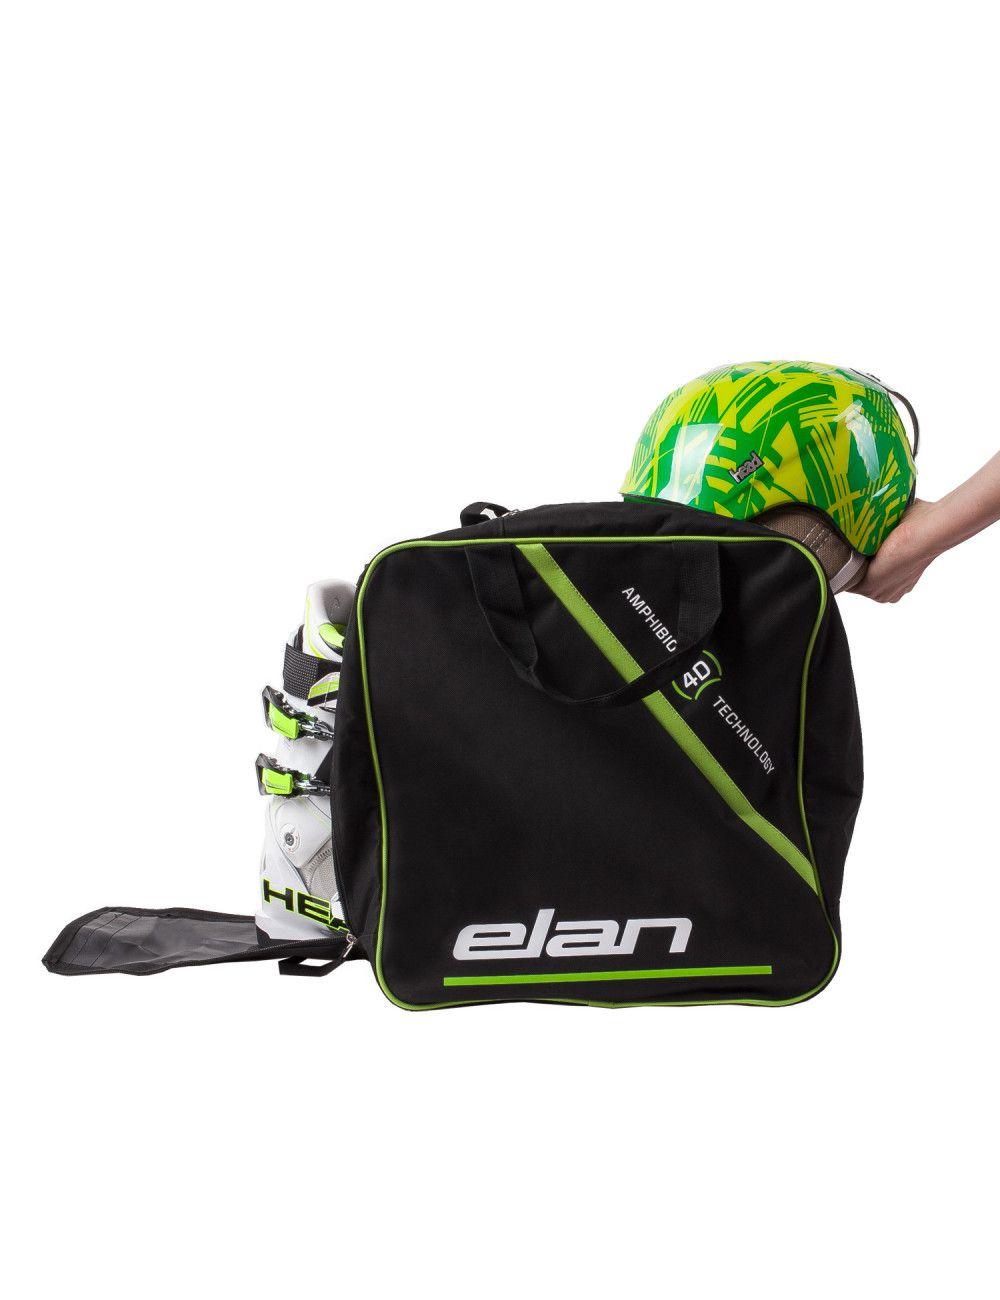 Plecak na buty i kask narciarski Elan SKI Boots AND Helmet